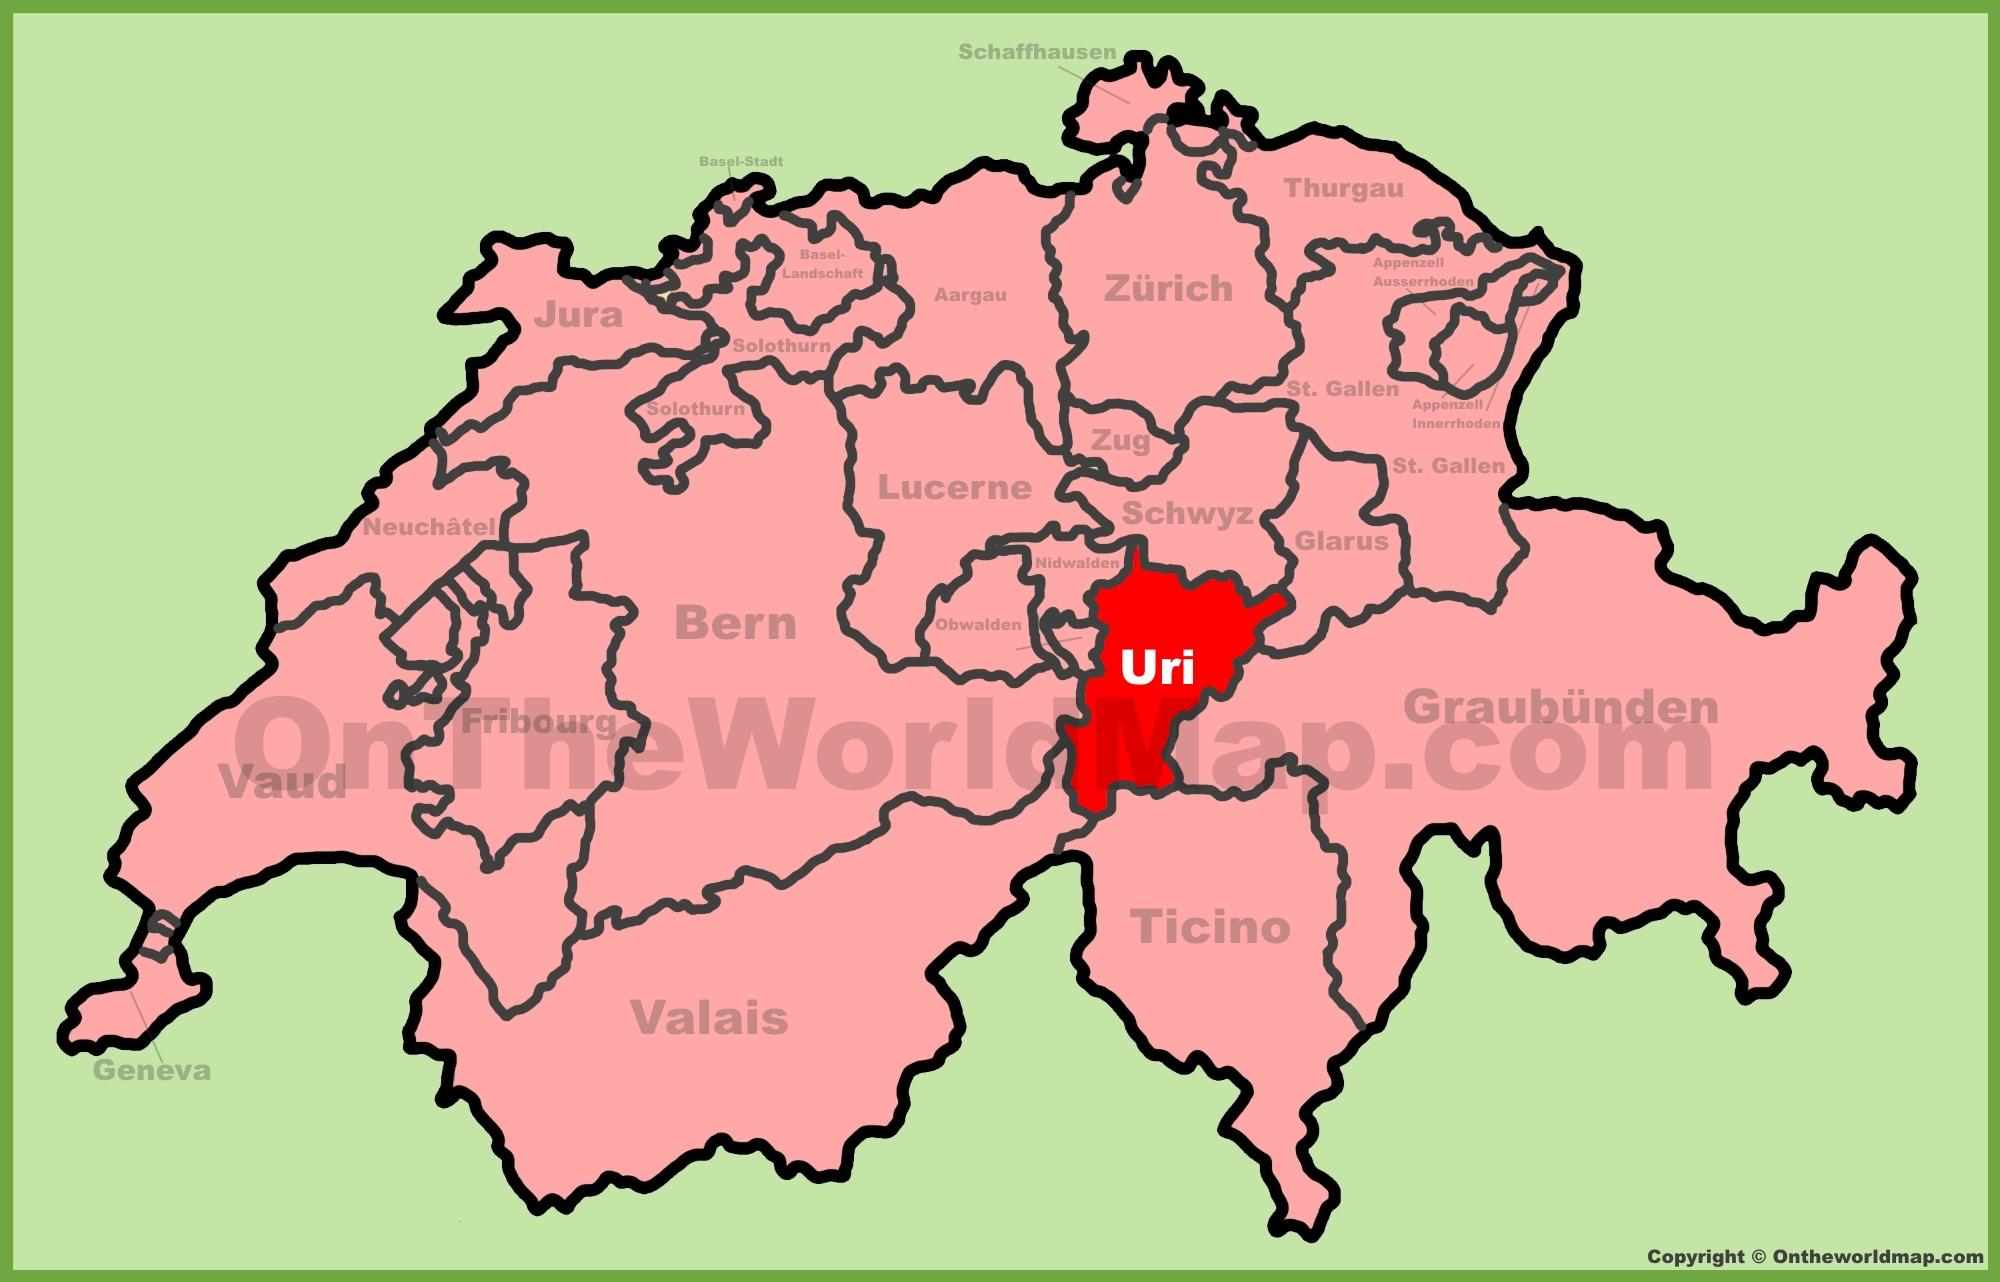 Canton of Uri location on the Switzerland map